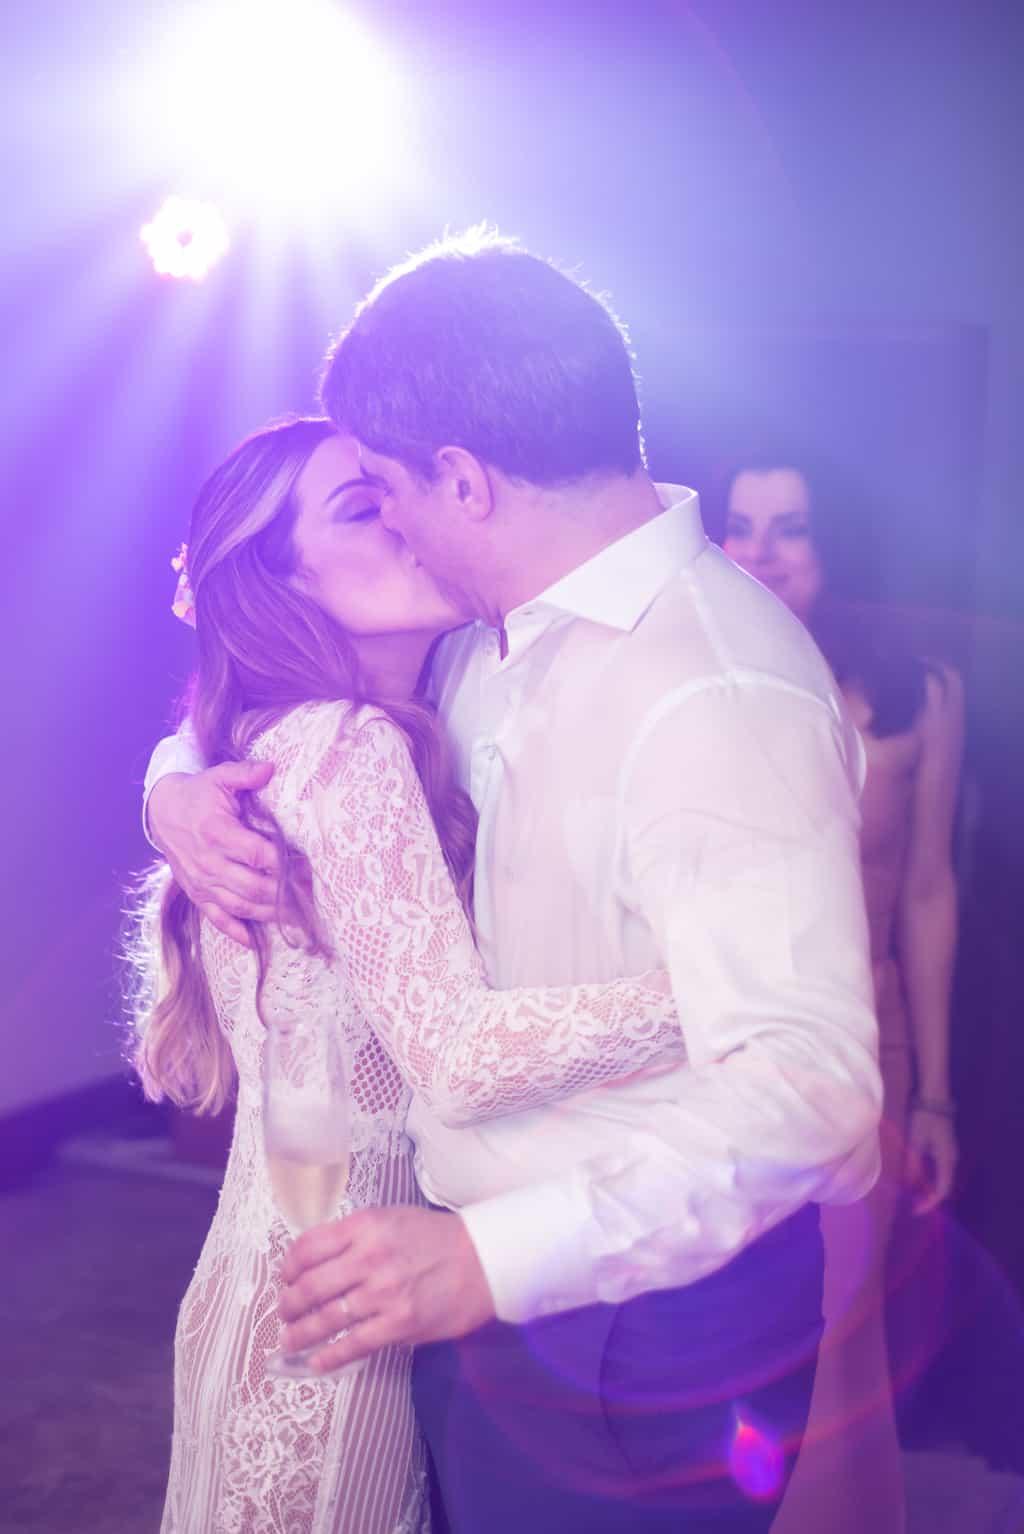 Casamento-Paula-e-Alex-Fotografia-Marina-Fava-casal-na-pista